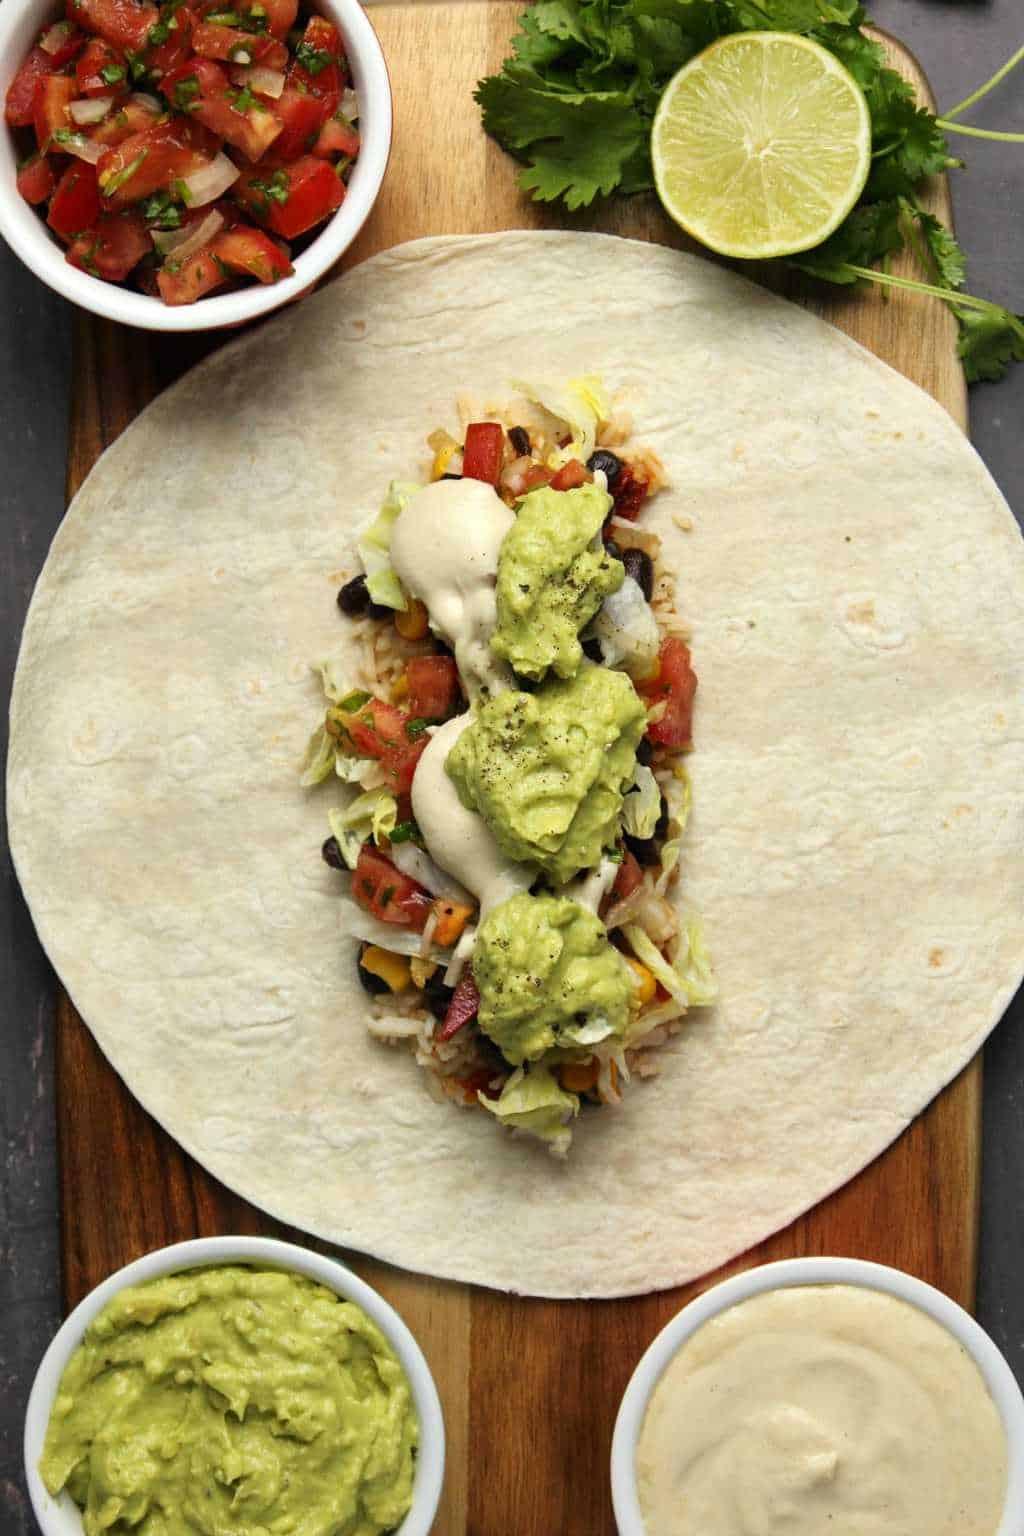 Assembling a vegan burrito on a wooden cutting board.